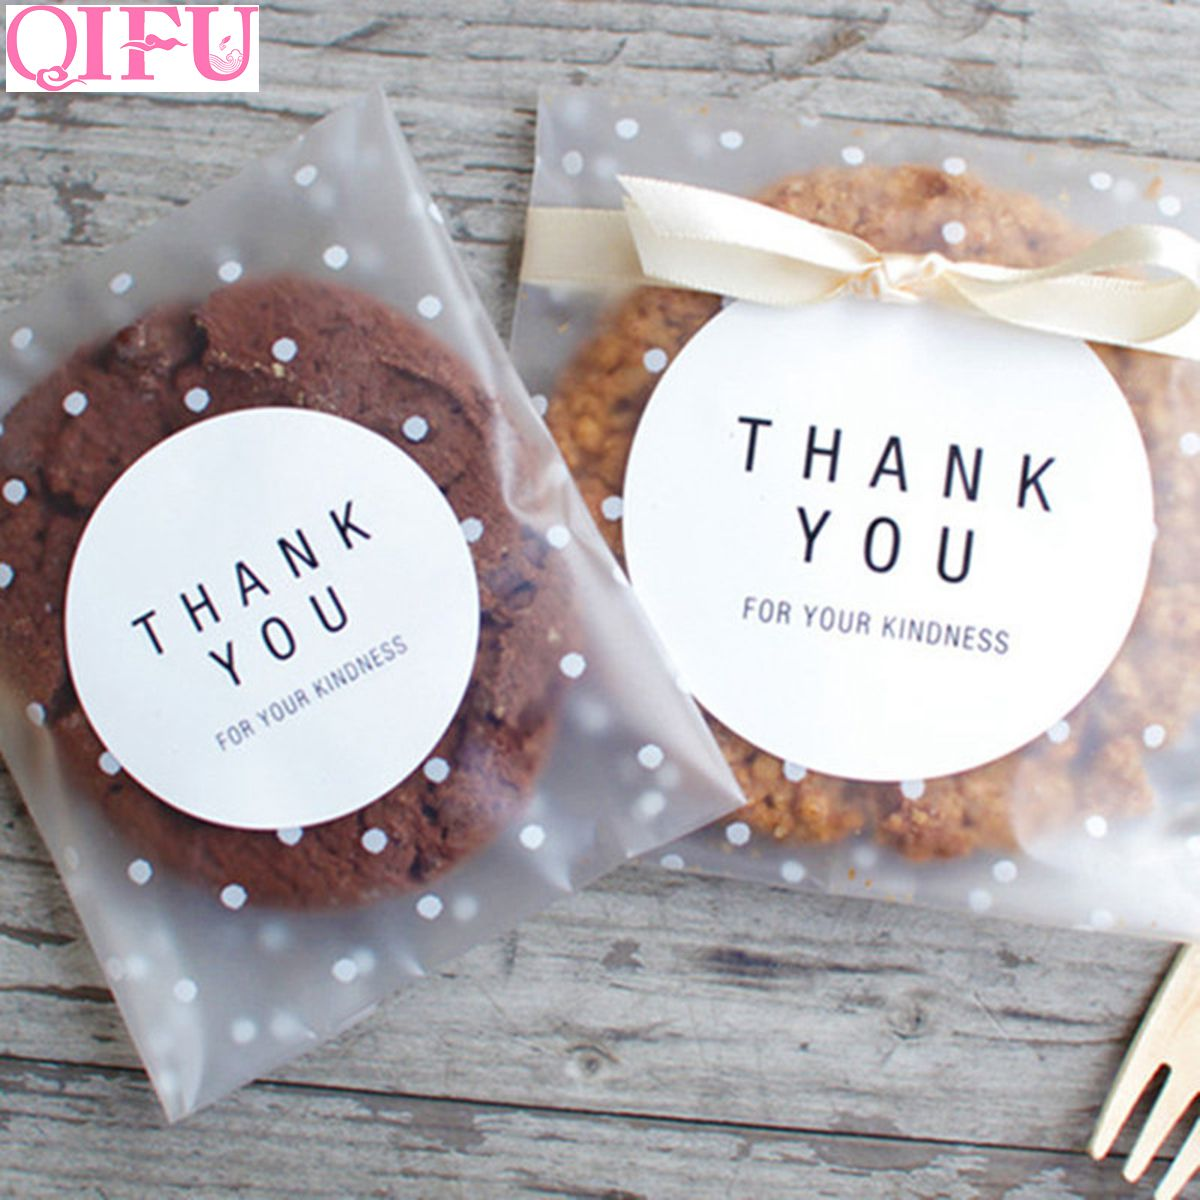 100pcs Plastic Sealing OPP Adhesive Cake Gift Packages Bag Bow Cookies Bag